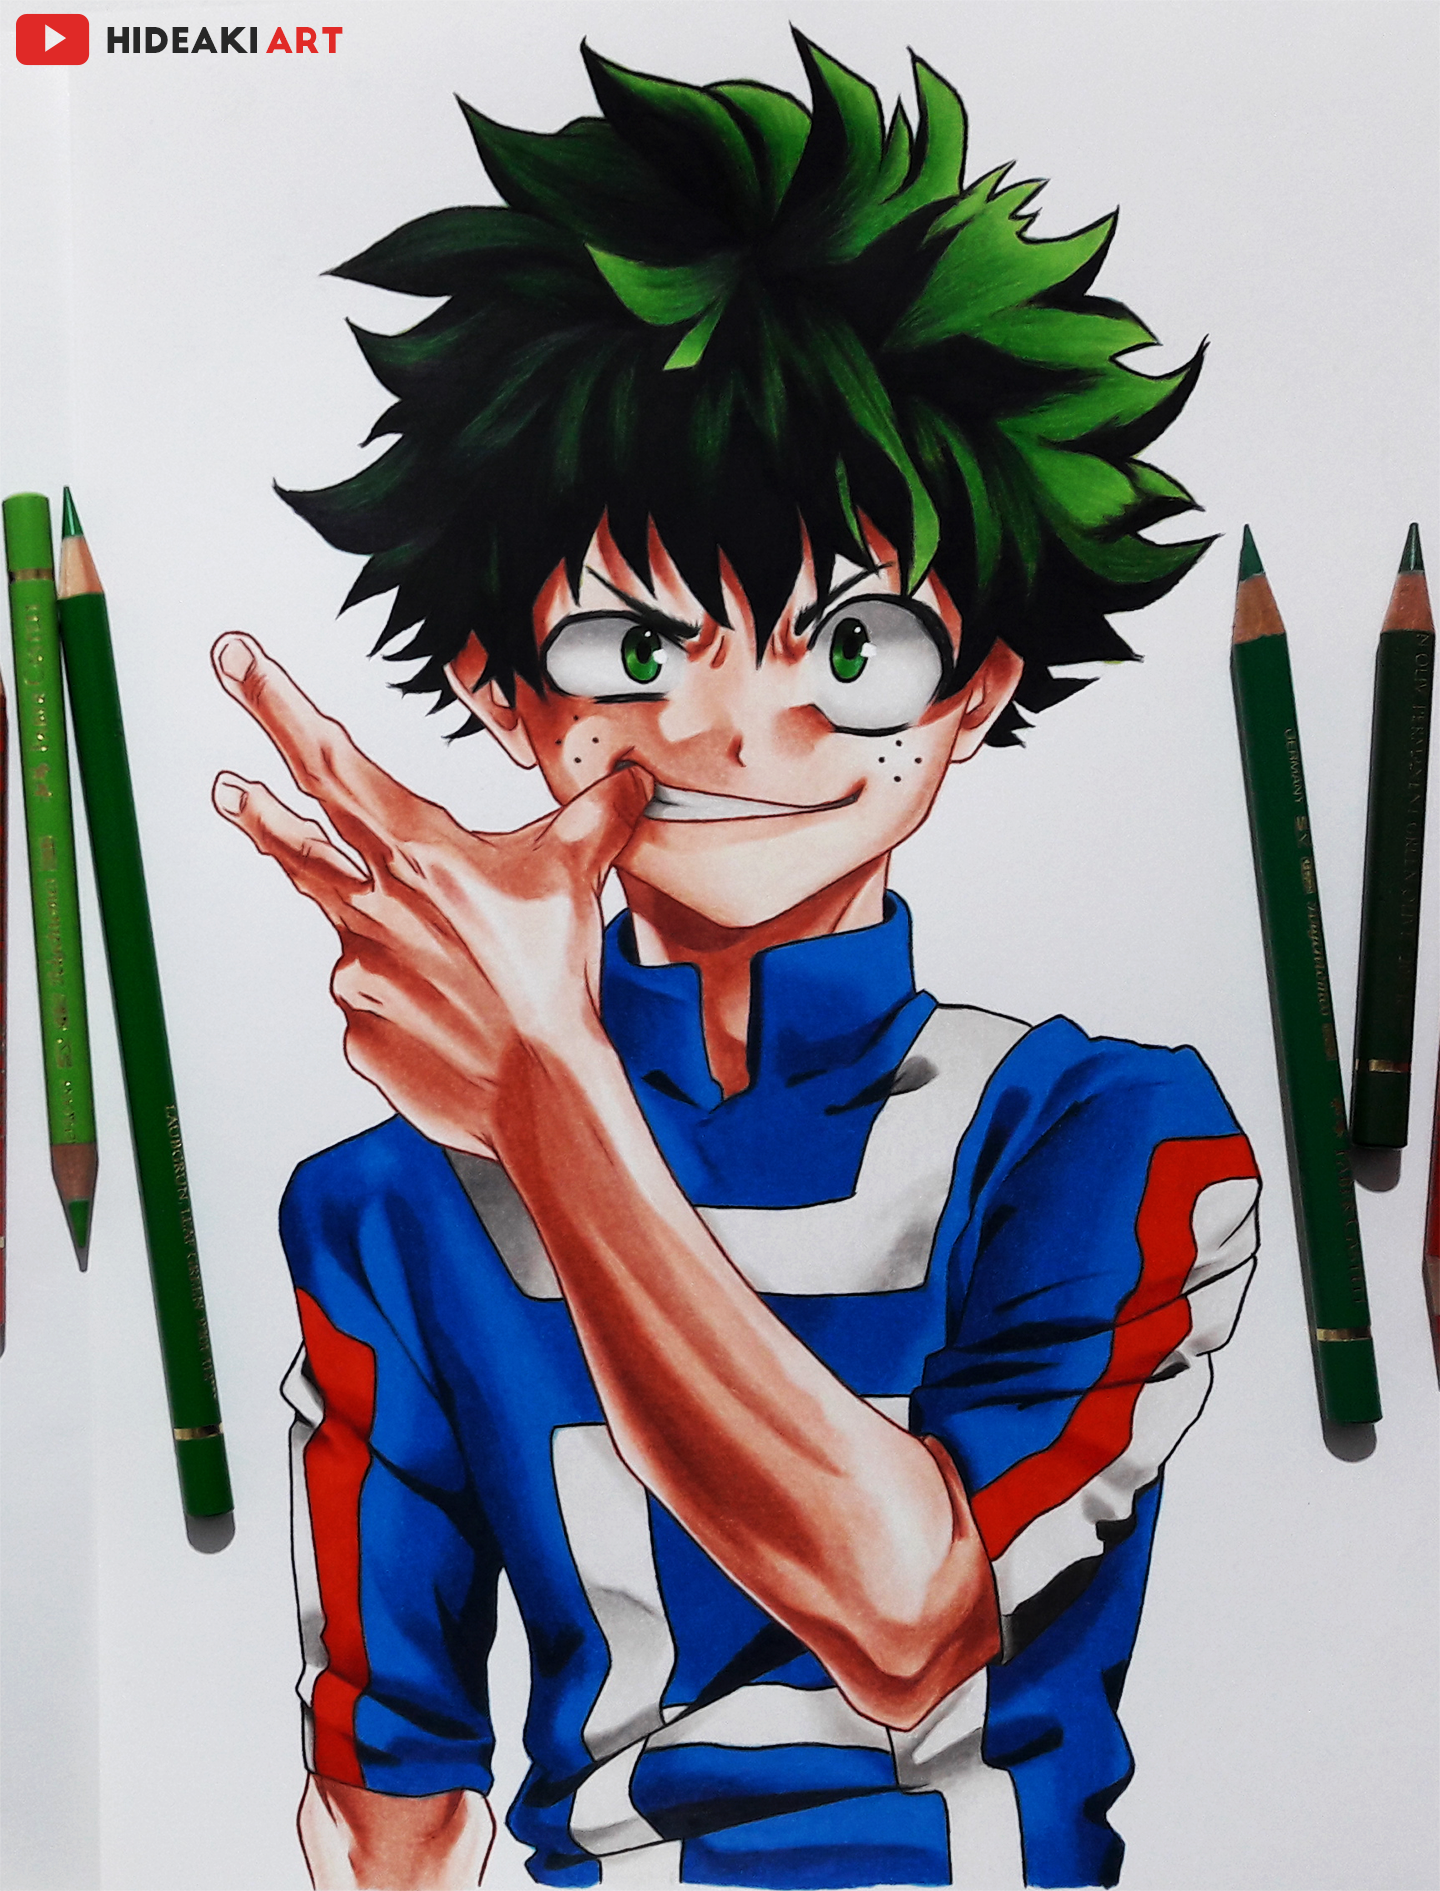 My Drawing Of Deku From My Hero Academia Desenho De Anime Desenhos De Anime Desenho De Ninja